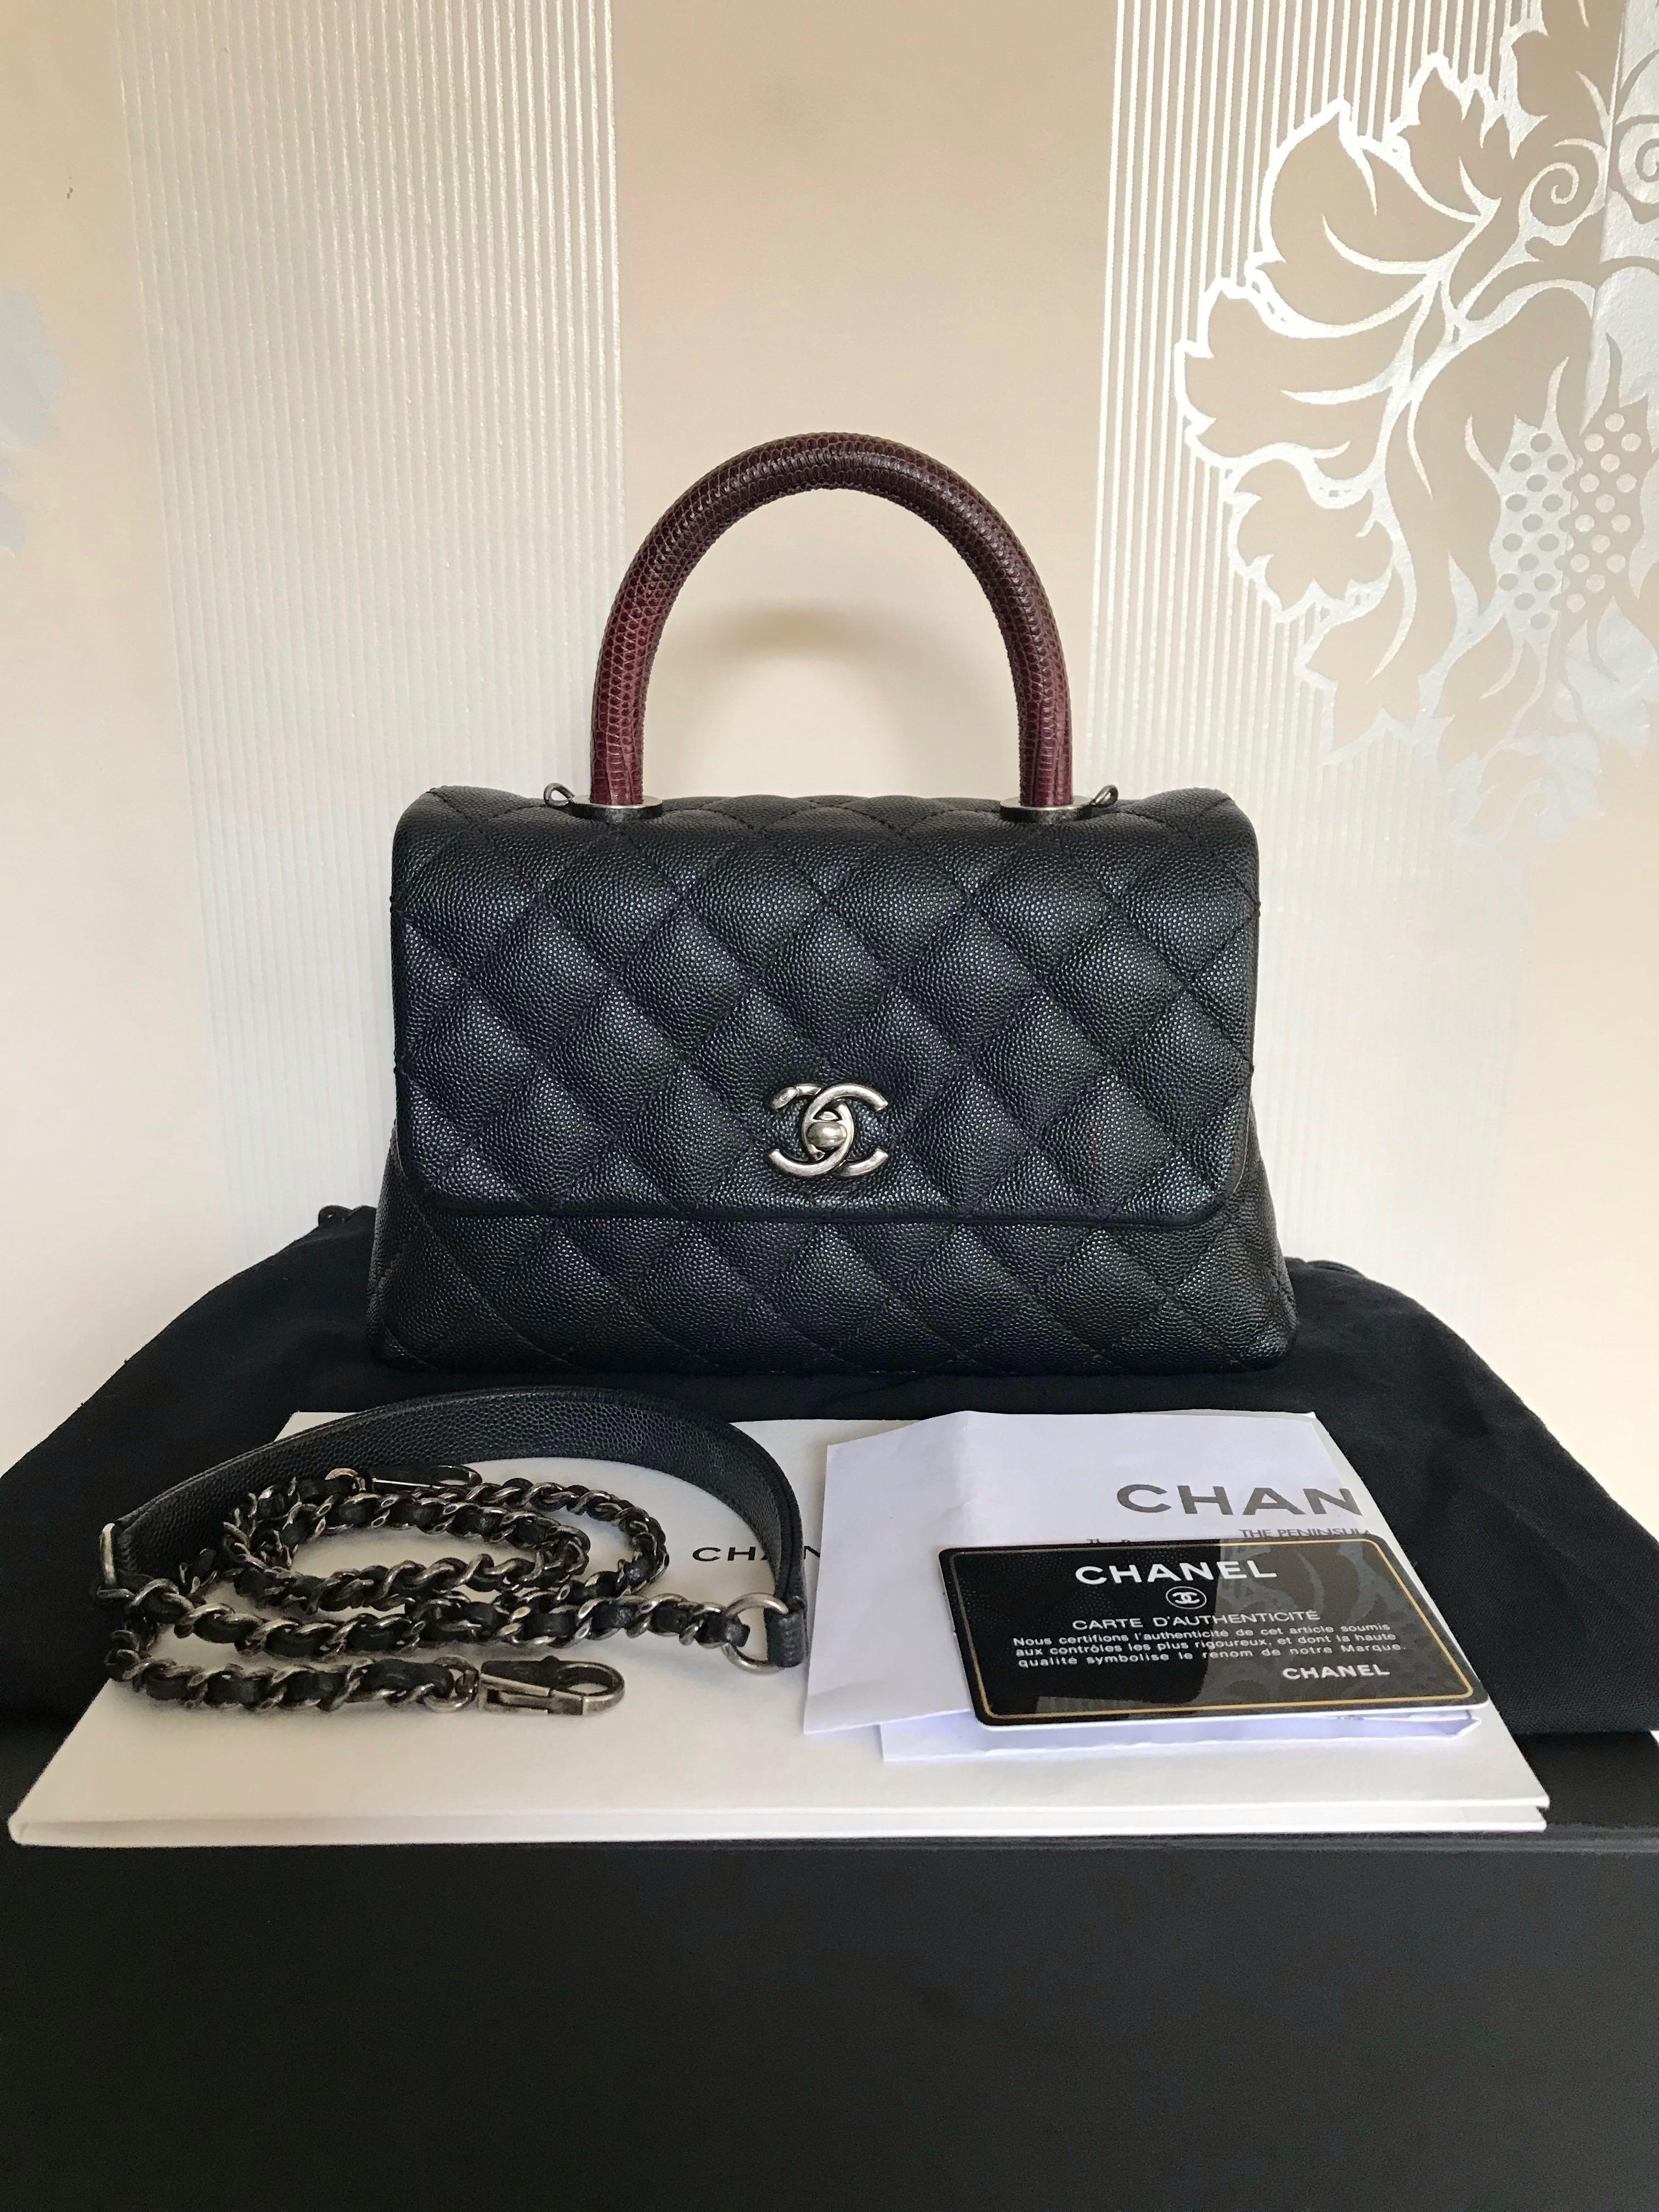 0c8091c4de31 Chanel coco handle sz mini 23 cm lizard handle rhw # 23, Luxury, Bags &  Wallets, Handbags on Carousell